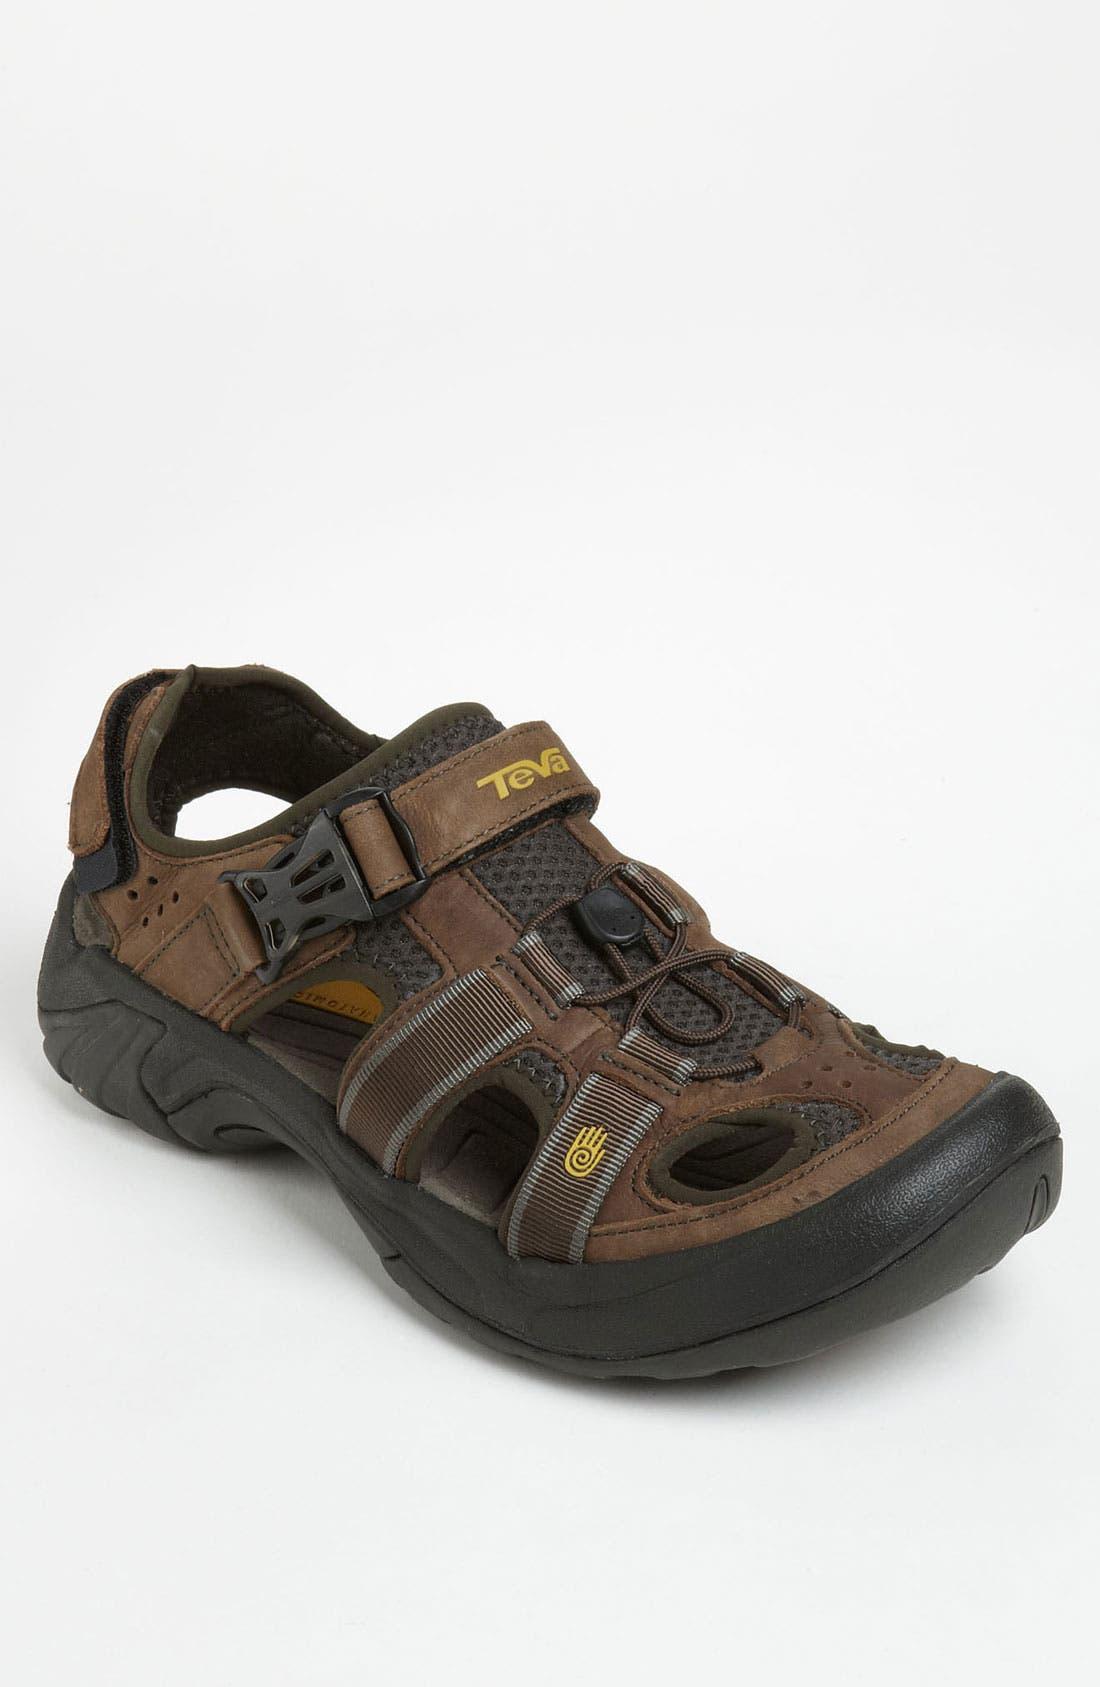 Main Image - Teva 'Omnium' Sandal